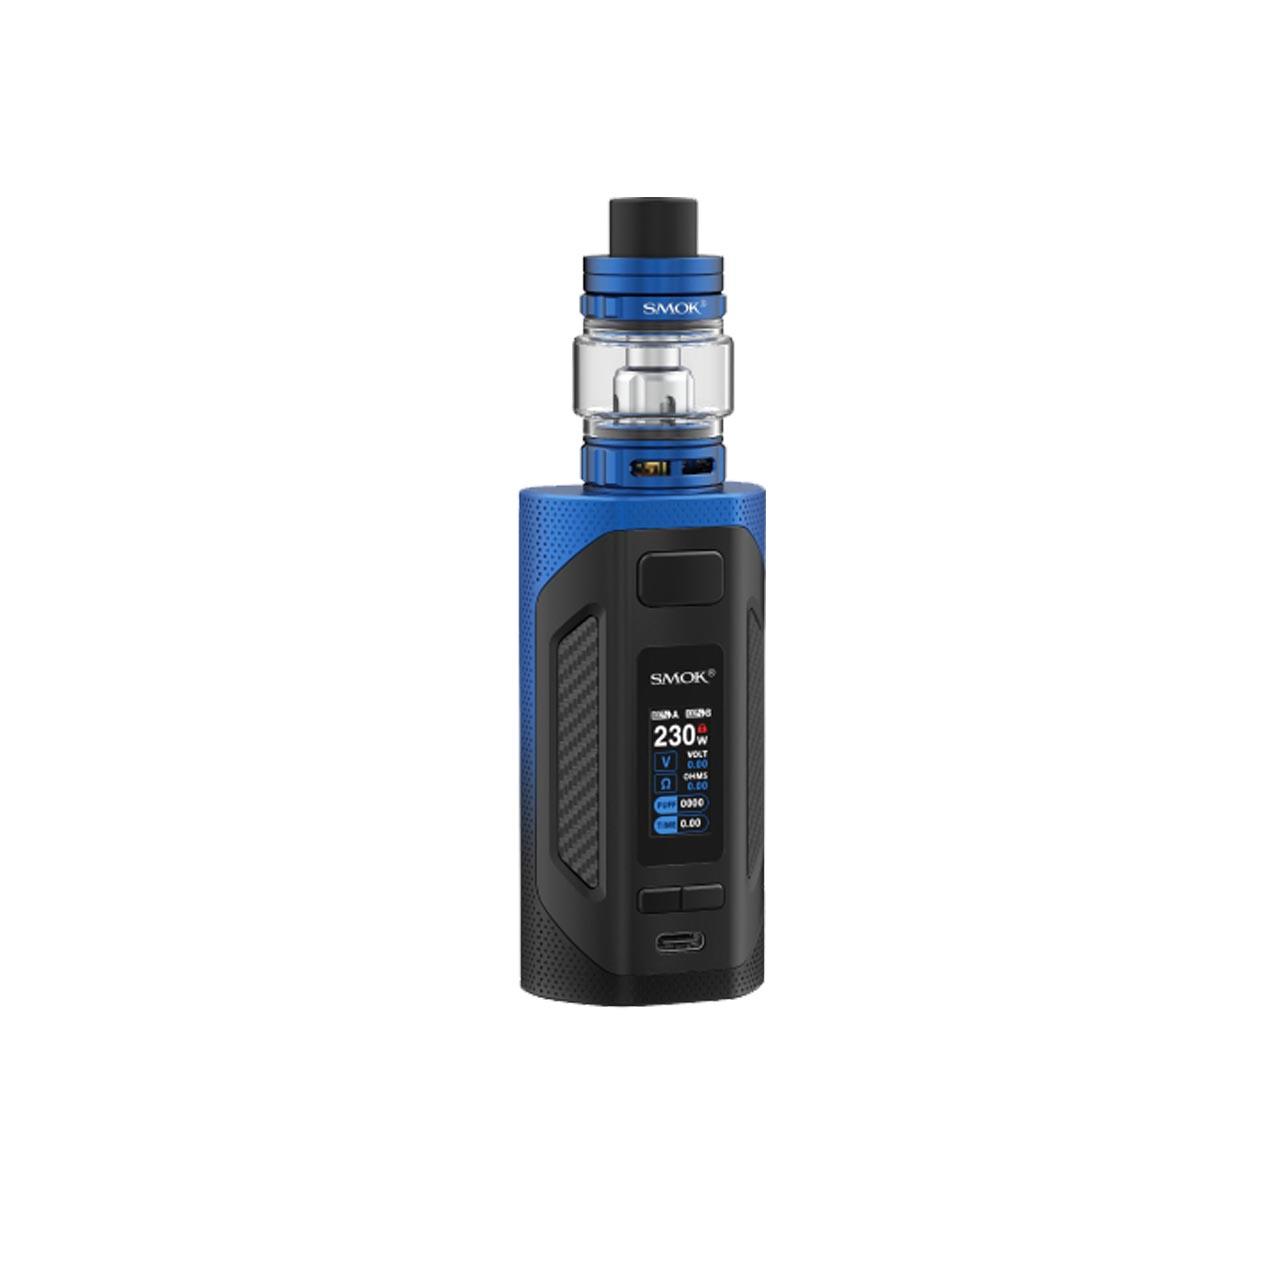 SMOK RIGEL Kit Blue